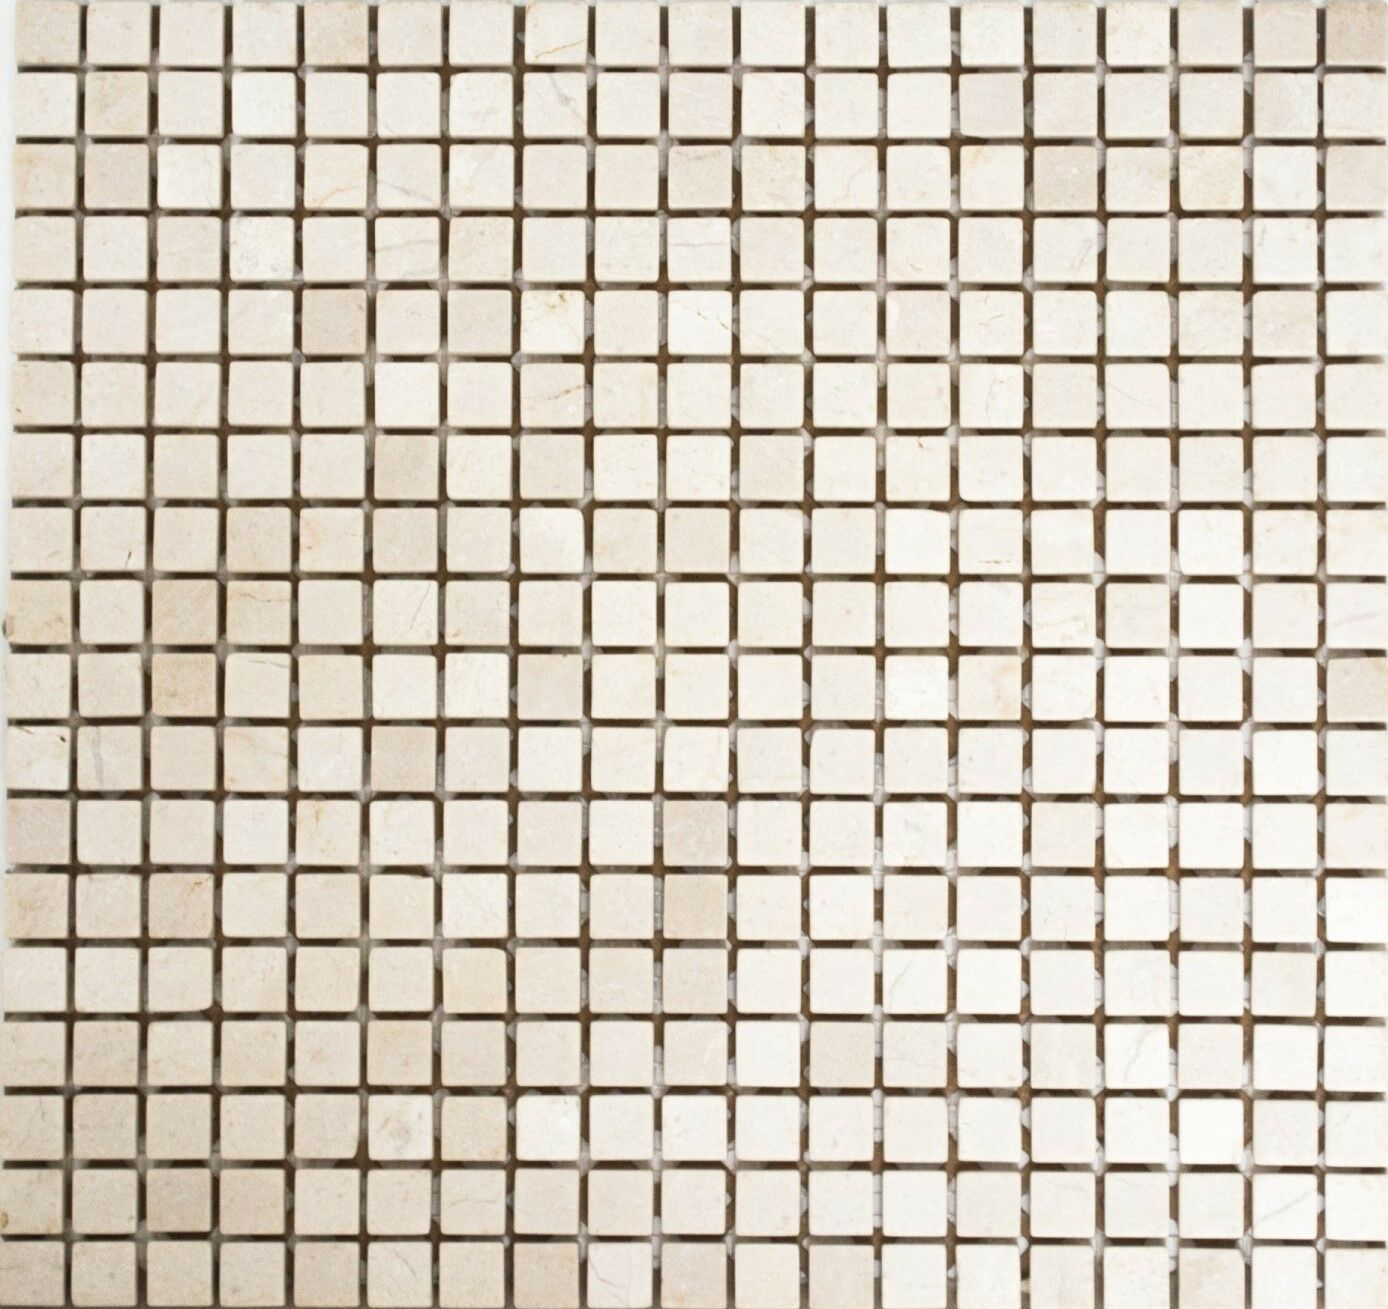 Mosaik Fliese Marmor Naturstein weiß Botticino Anticato    38-0104_f   10 Matten